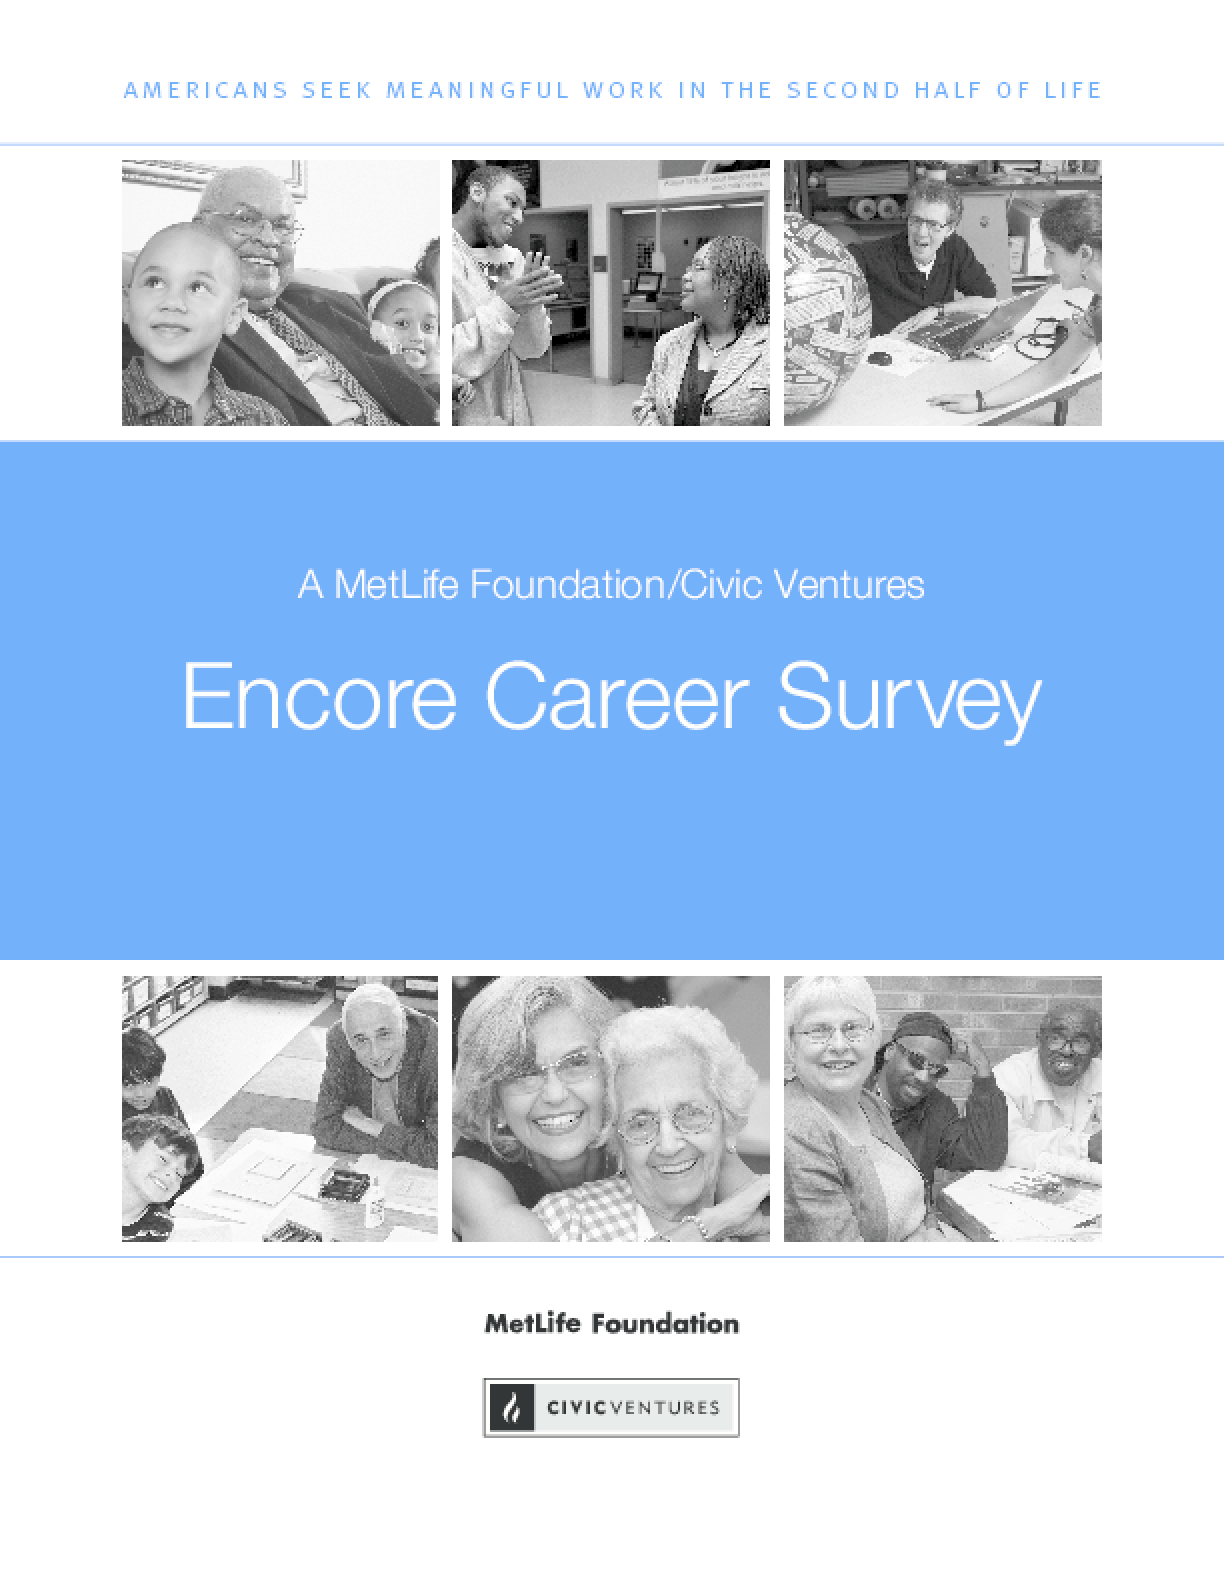 MetLife Foundation/Civic Ventures Encore Career Survey